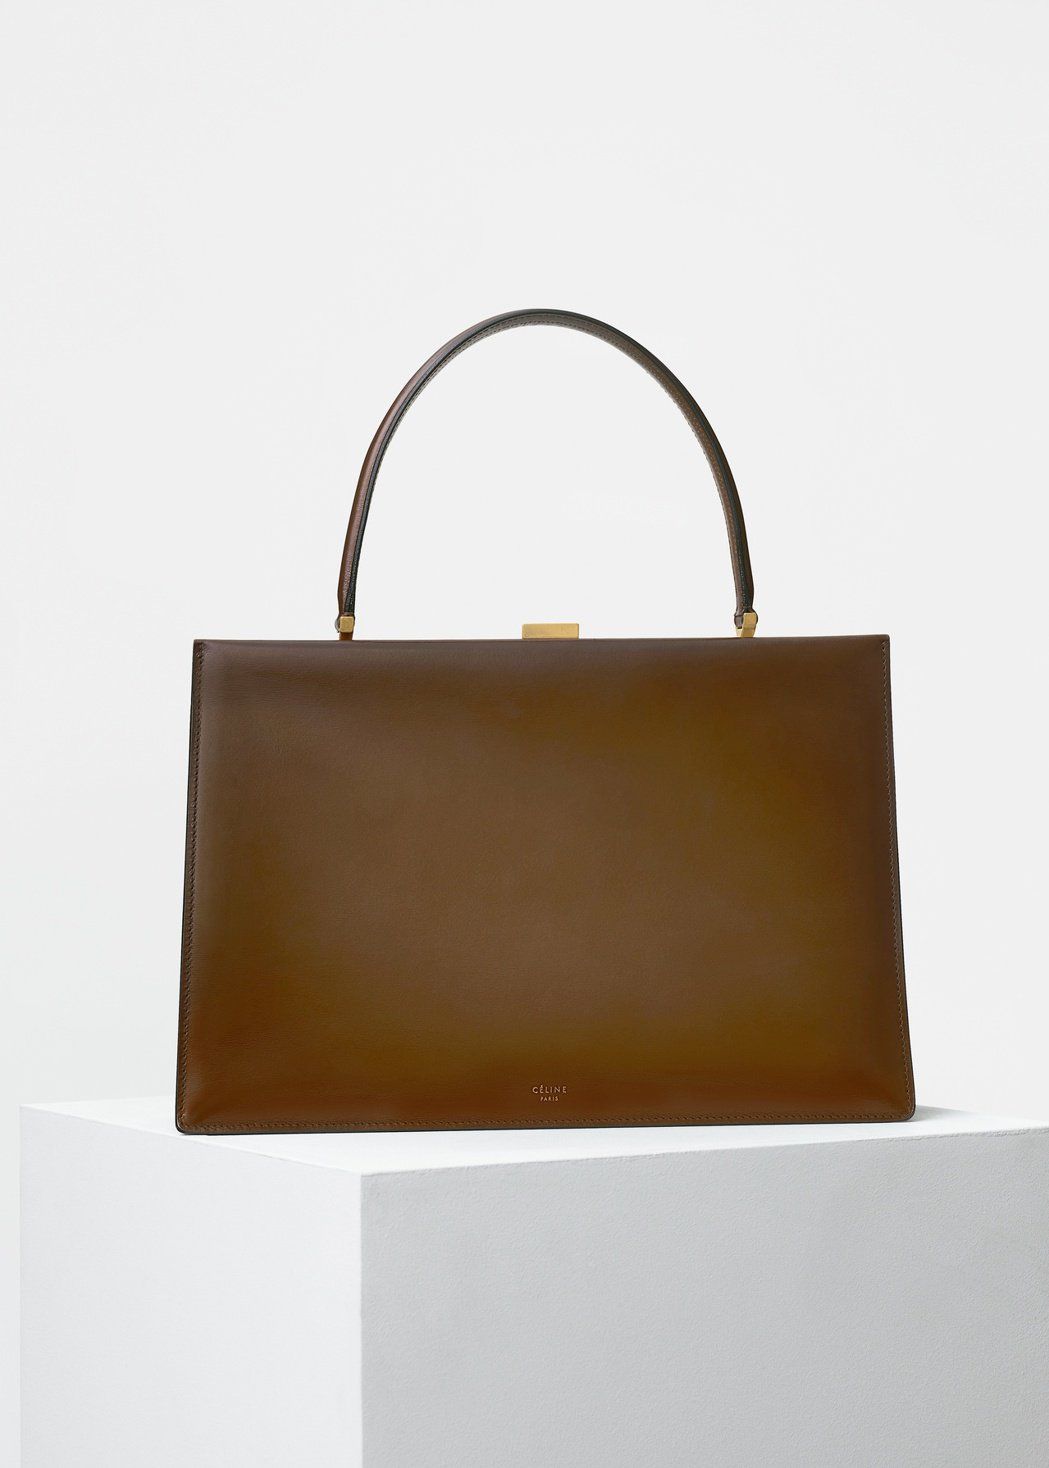 CLASP MEDIUM棕駝色光滑小牛皮手提包,售價130,000元。圖/CEL...